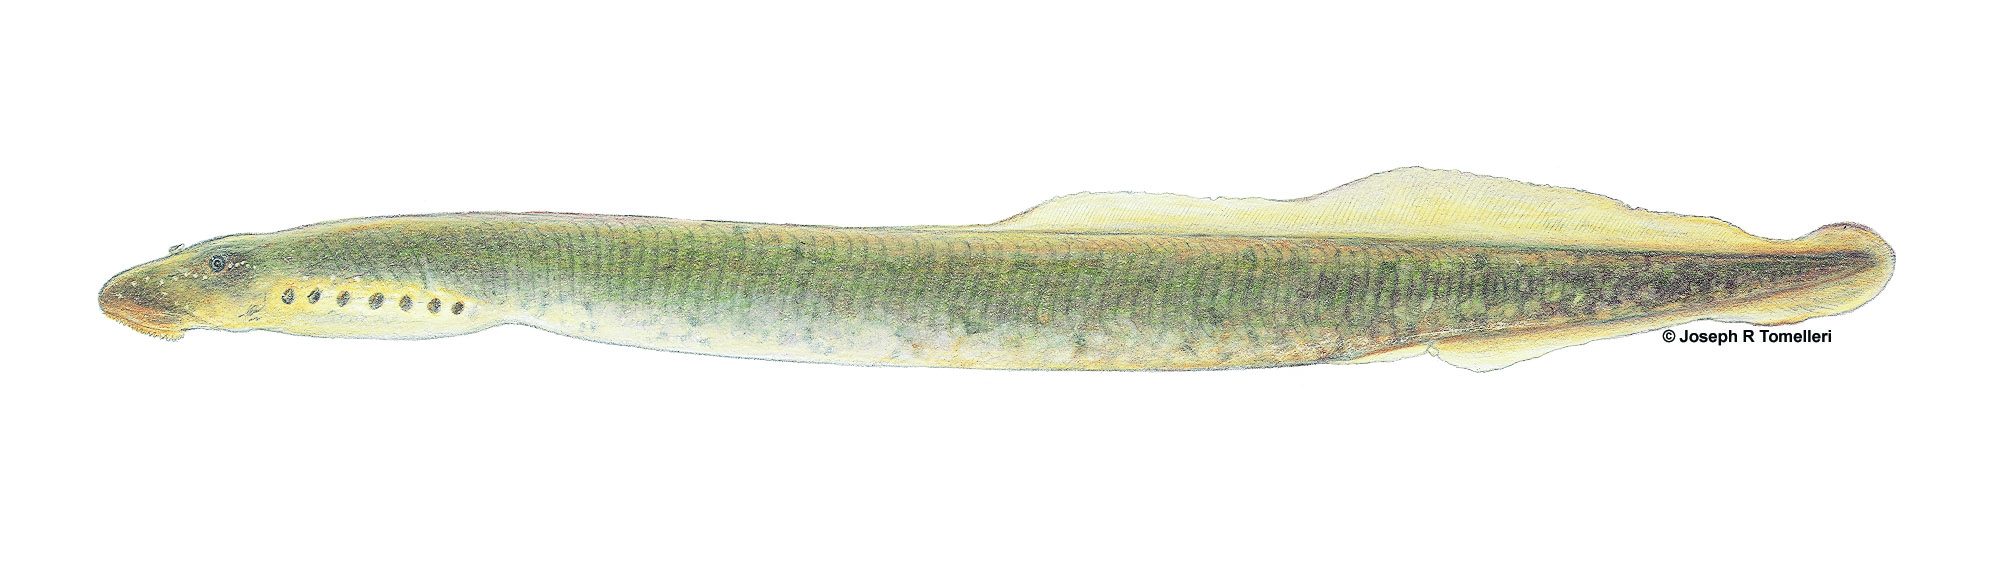 ichthyomyzon_greeleyi_mountain_brook_lamprey_1